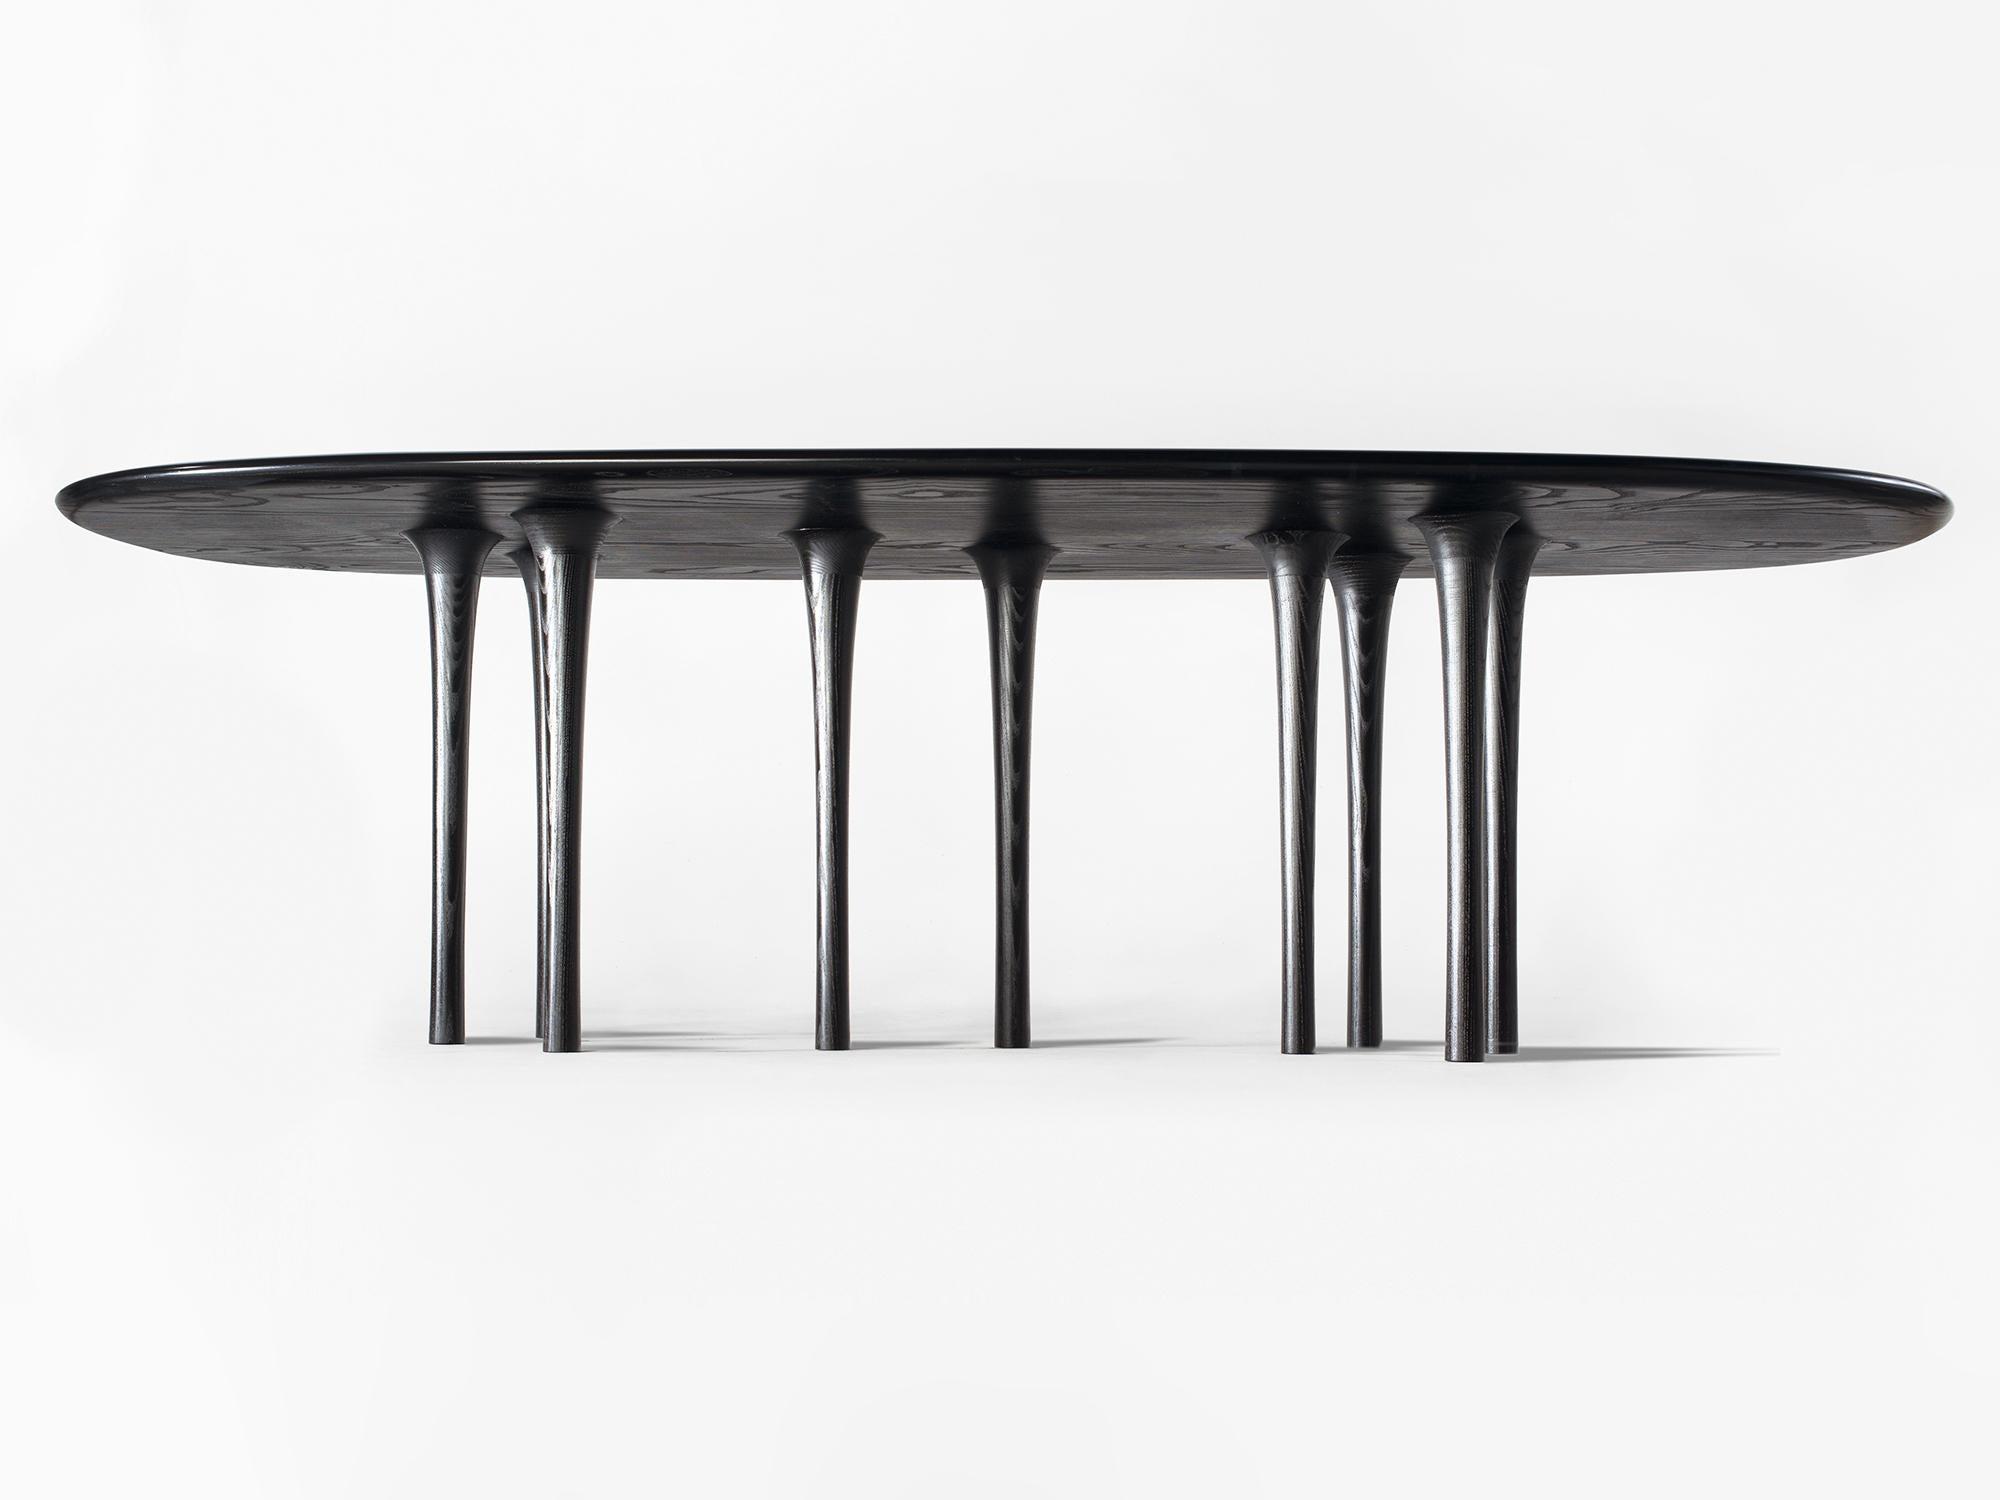 Hand Carved Wooden Dining Table By Hudson Valley Based Artist And Designer  Christopher Kurtz